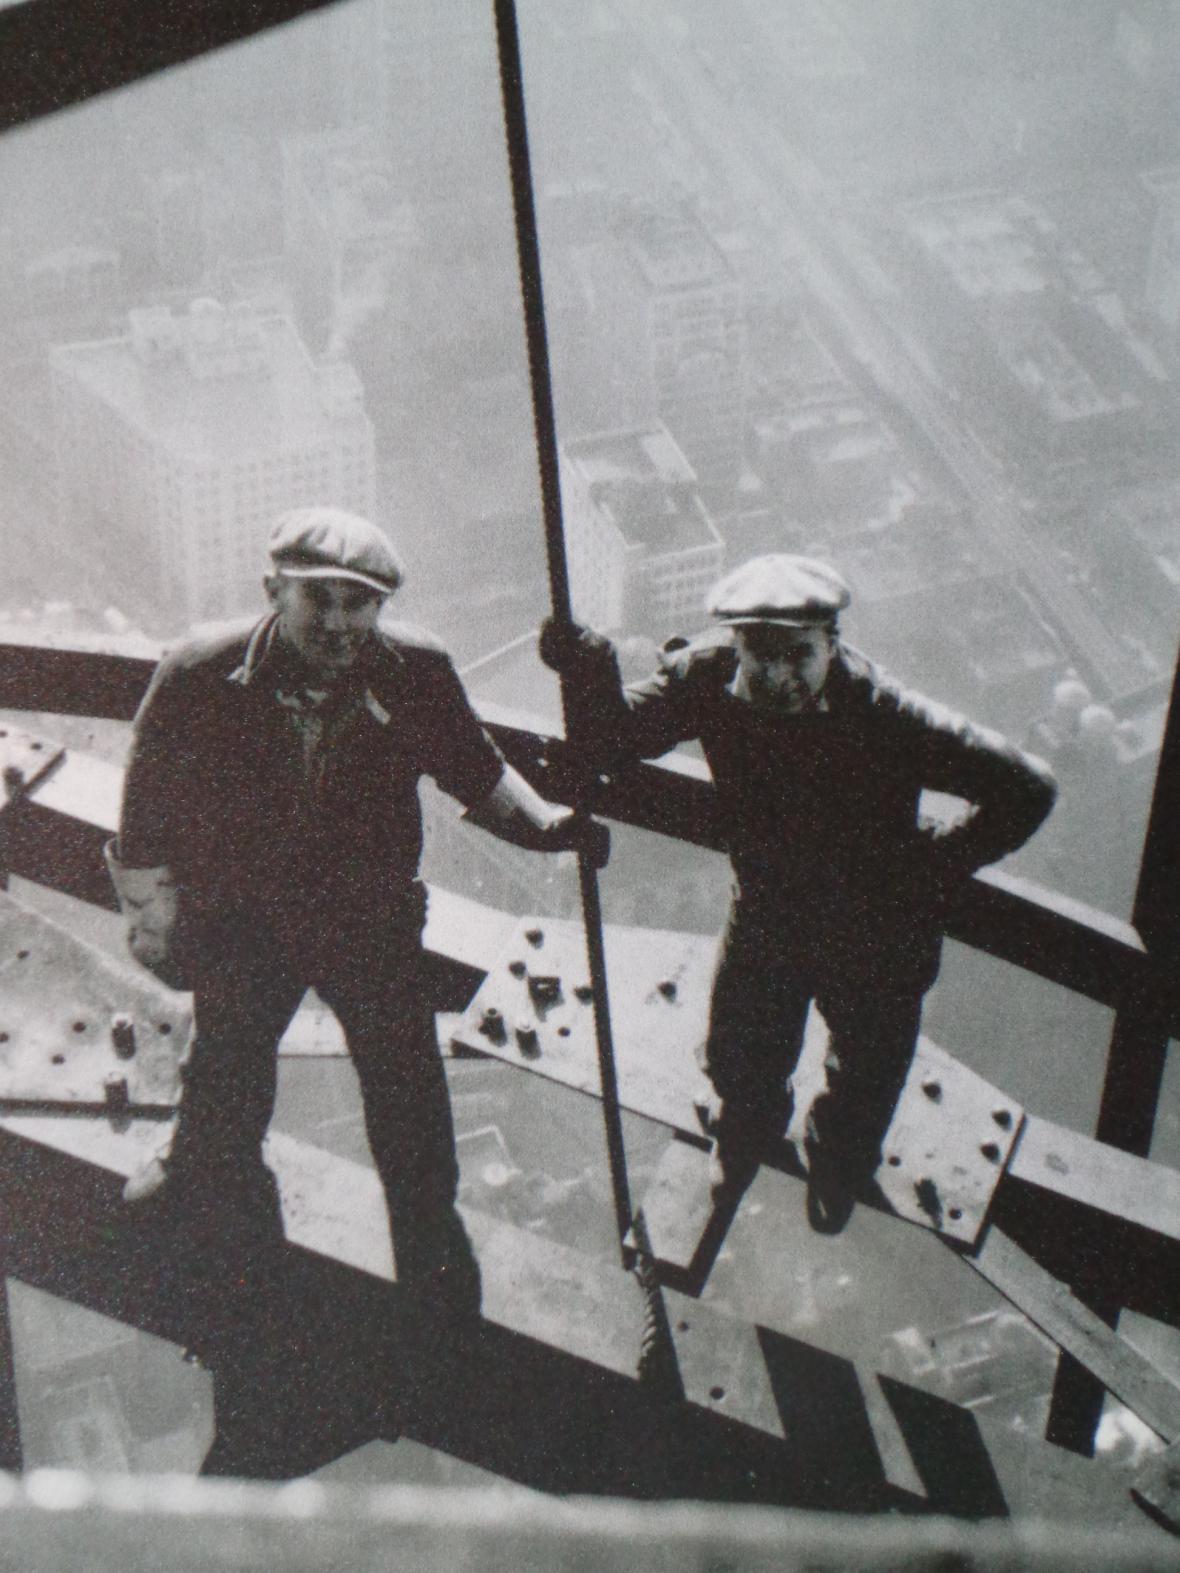 Stavba Empire State Building